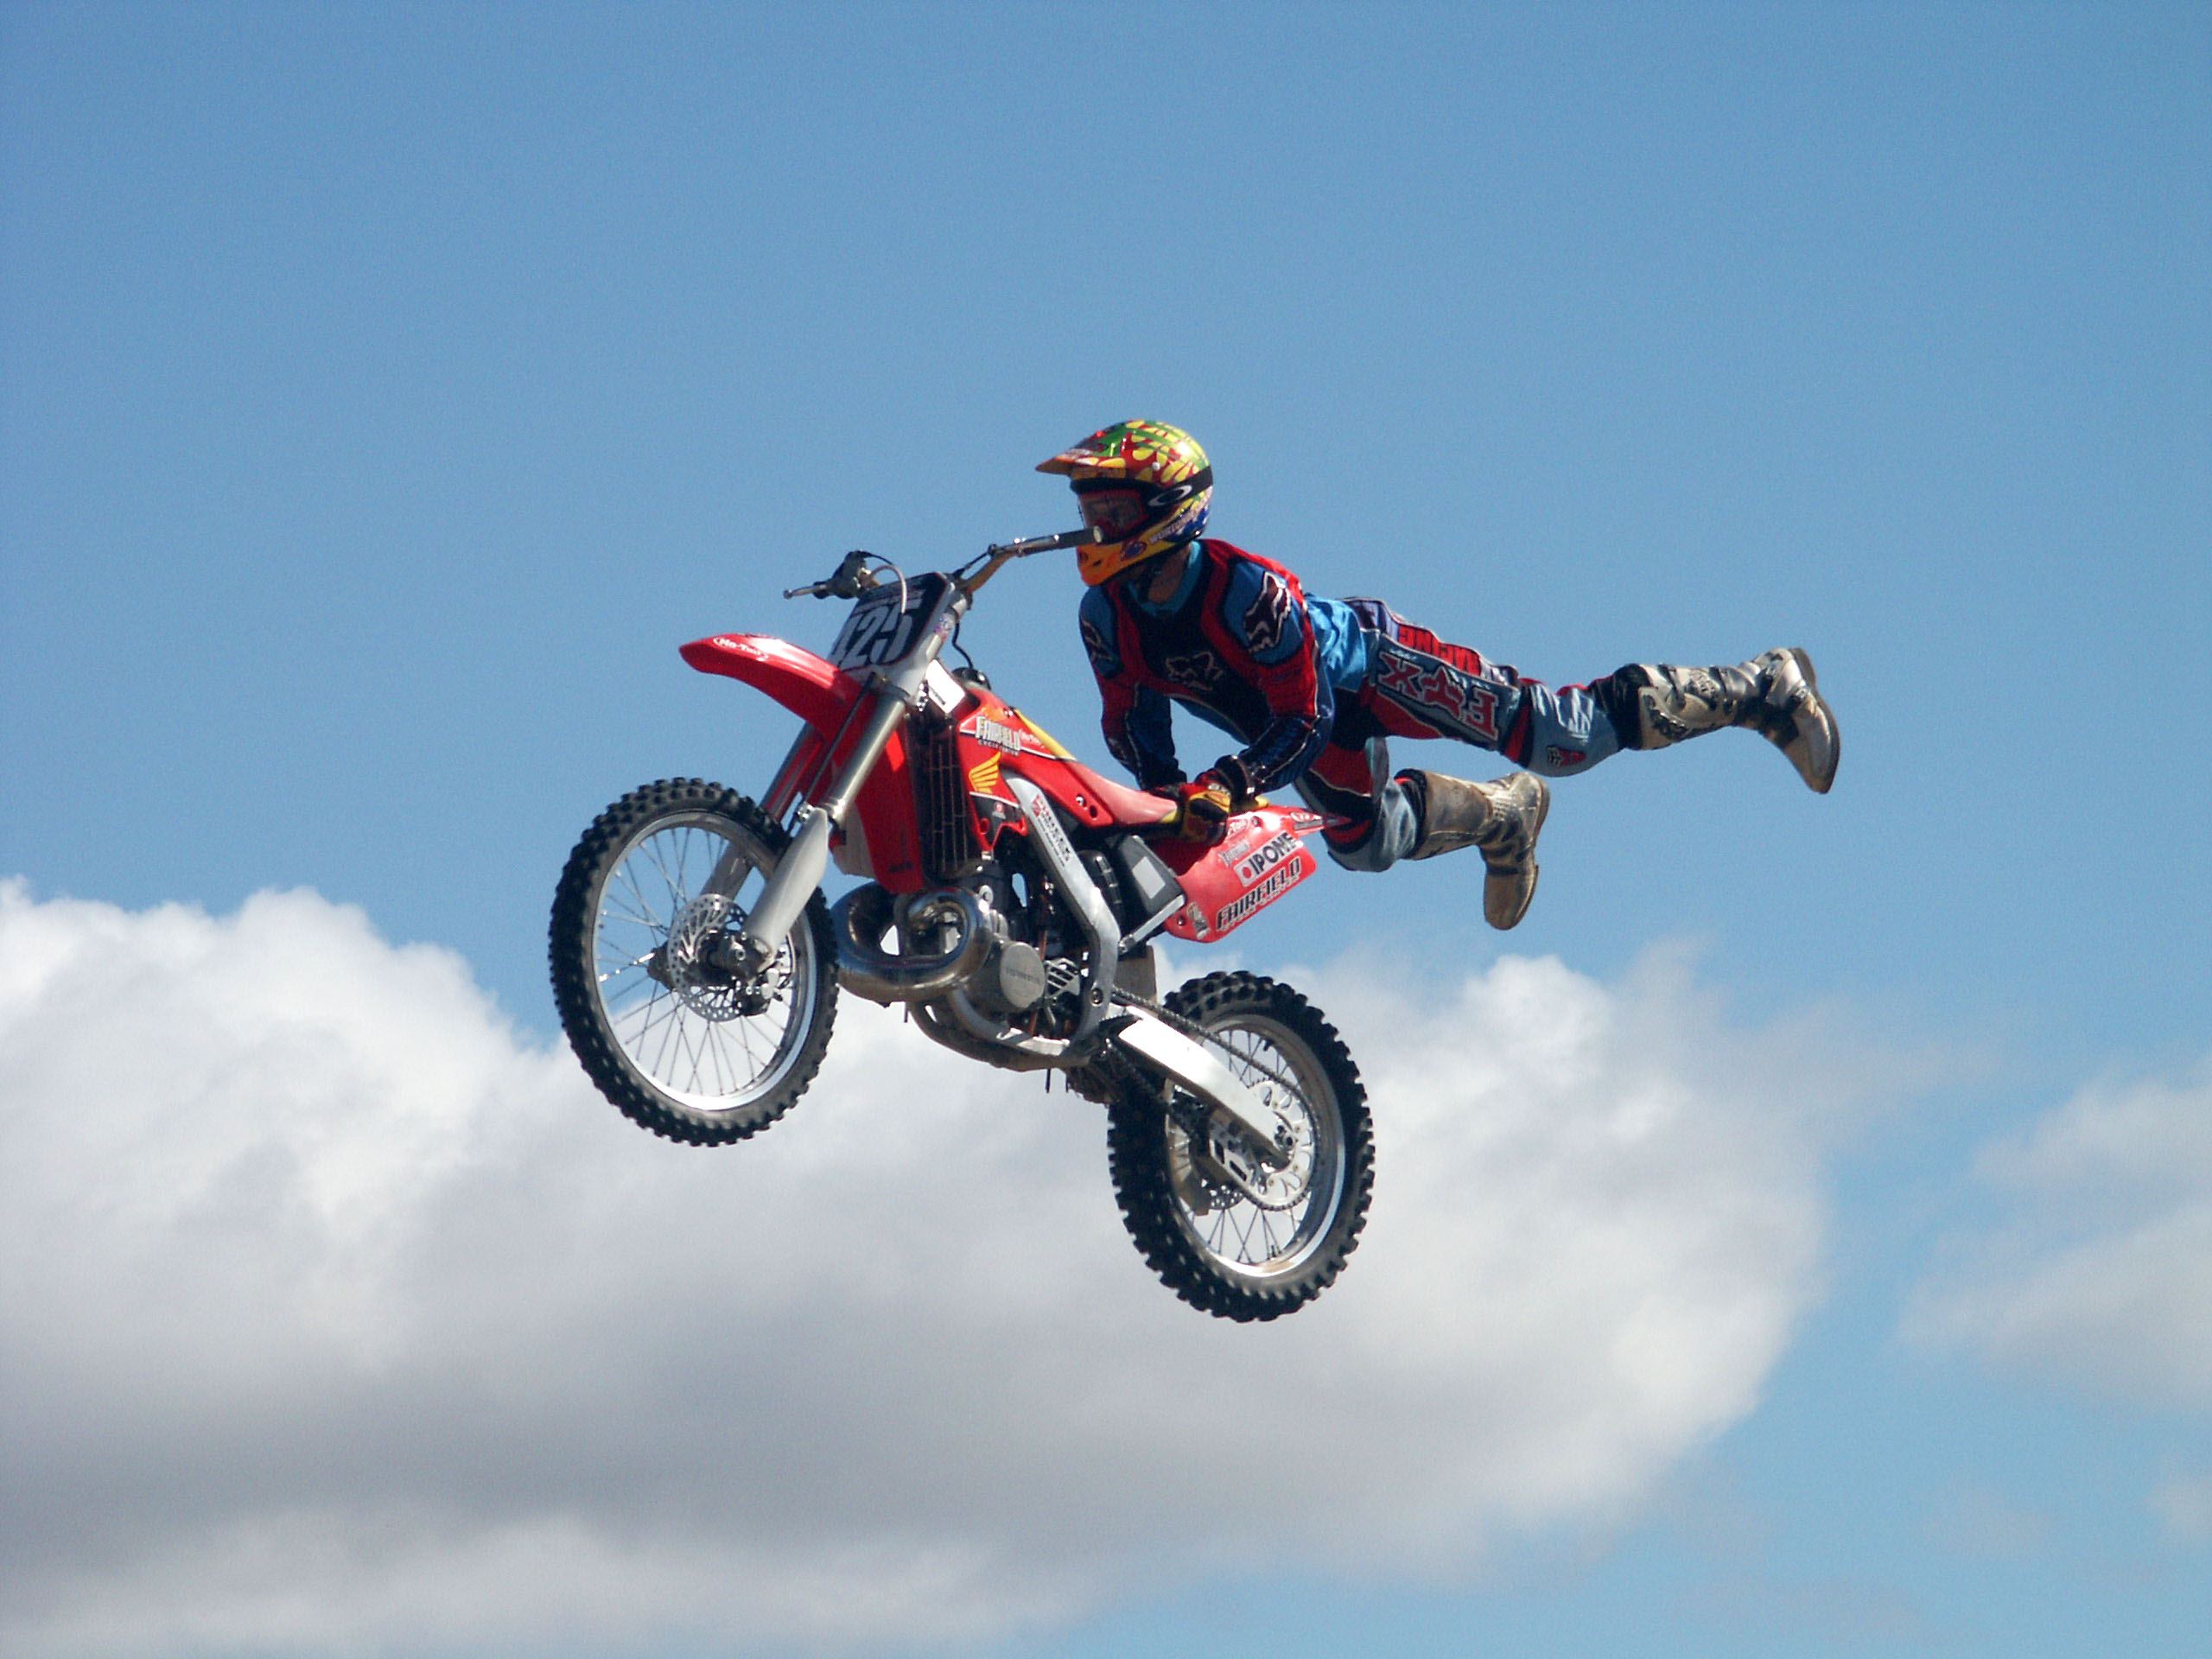 Motocross free style